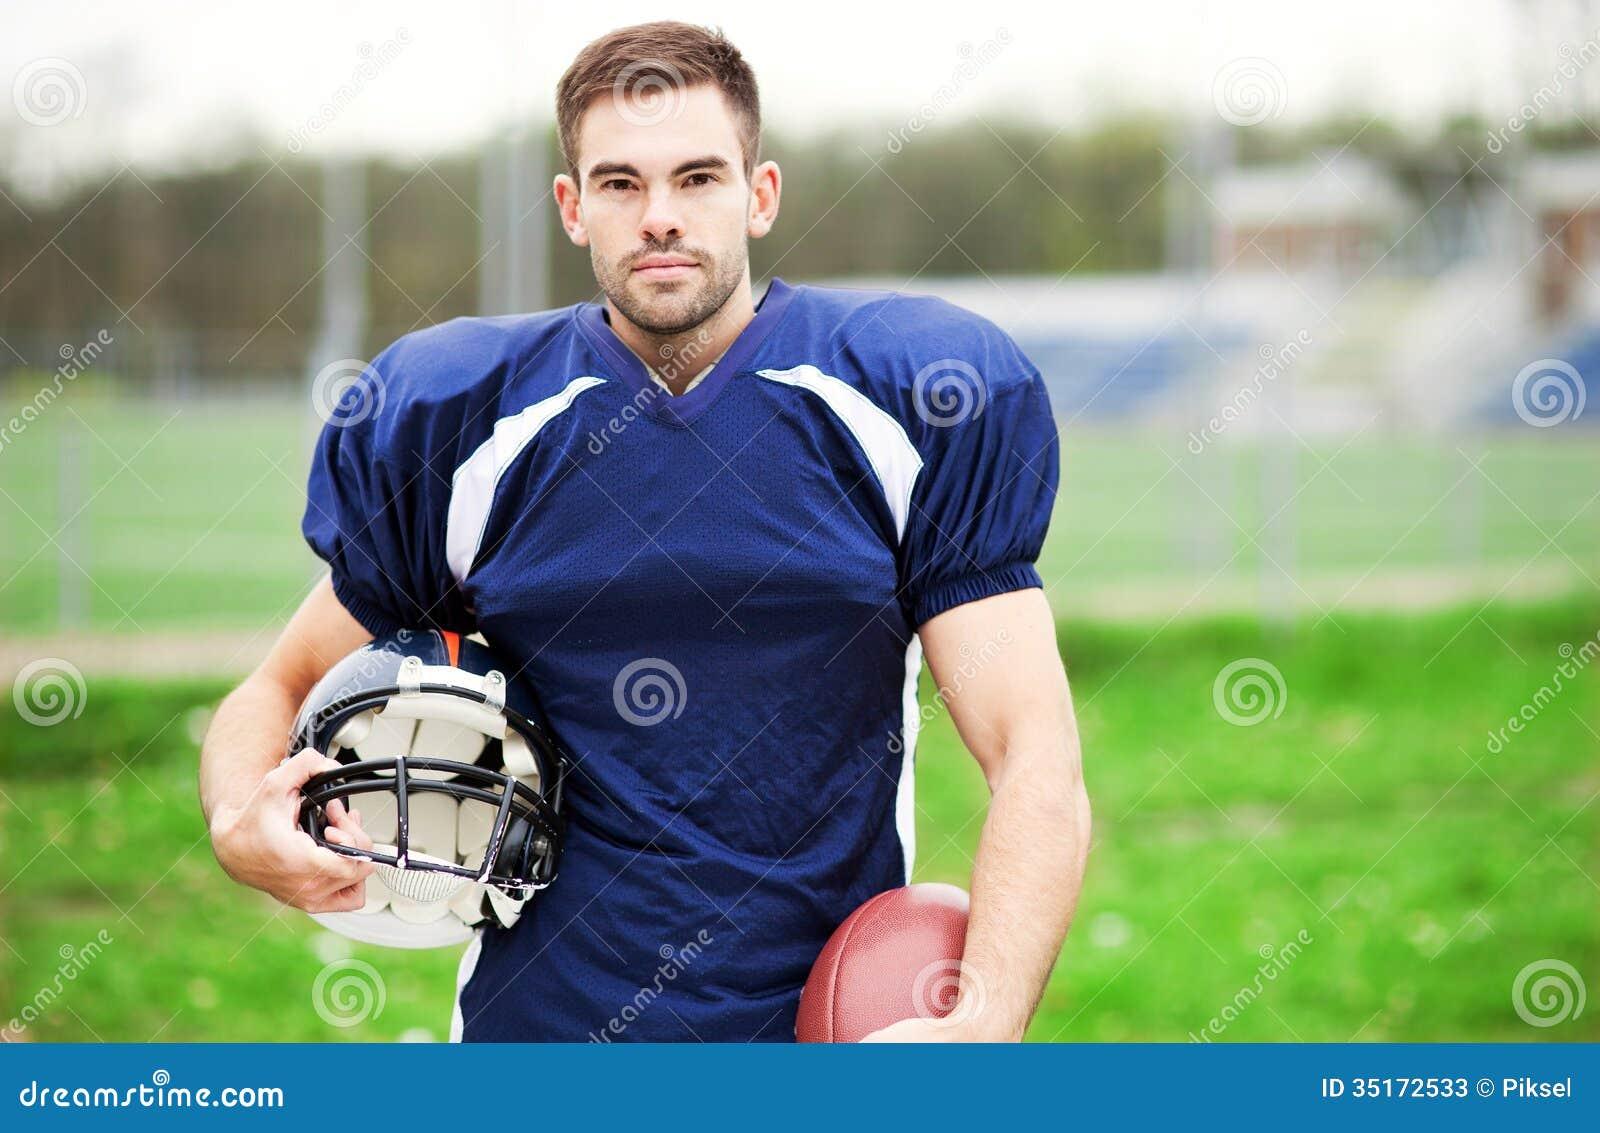 American Football Player Stock Photos Image 35172533